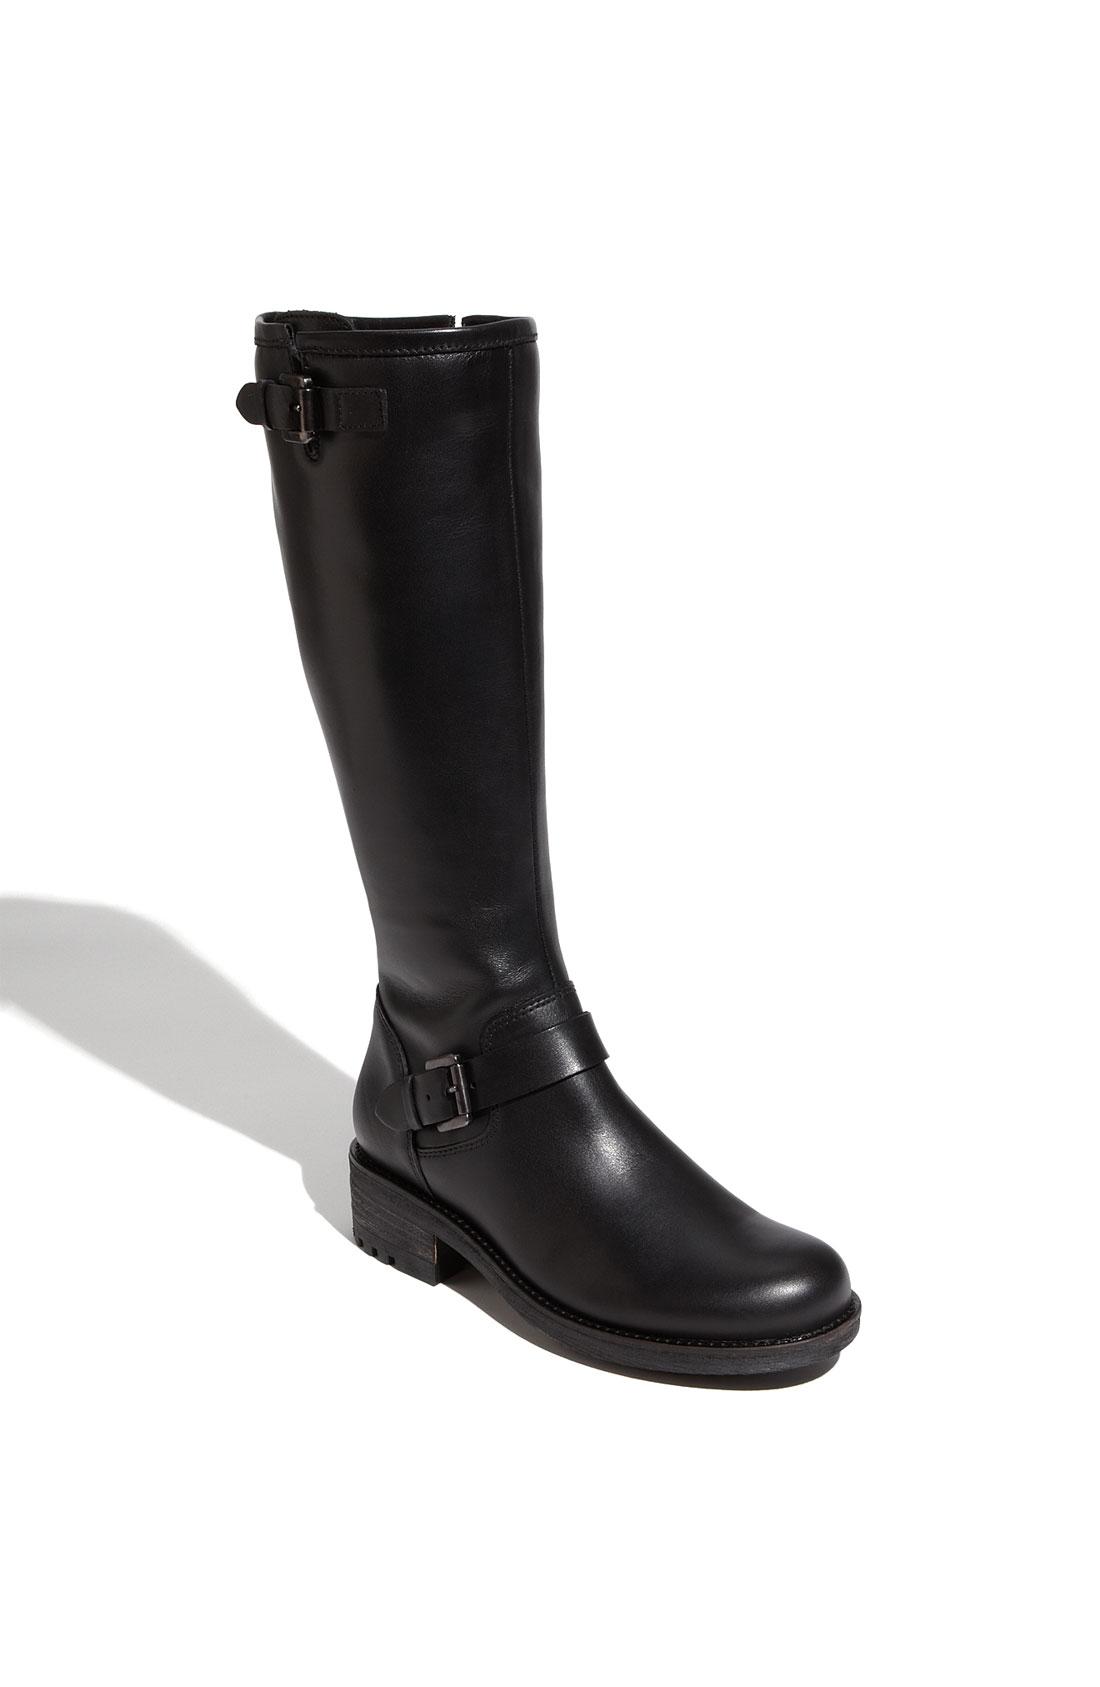 Ugg Womens Caleb Shoes